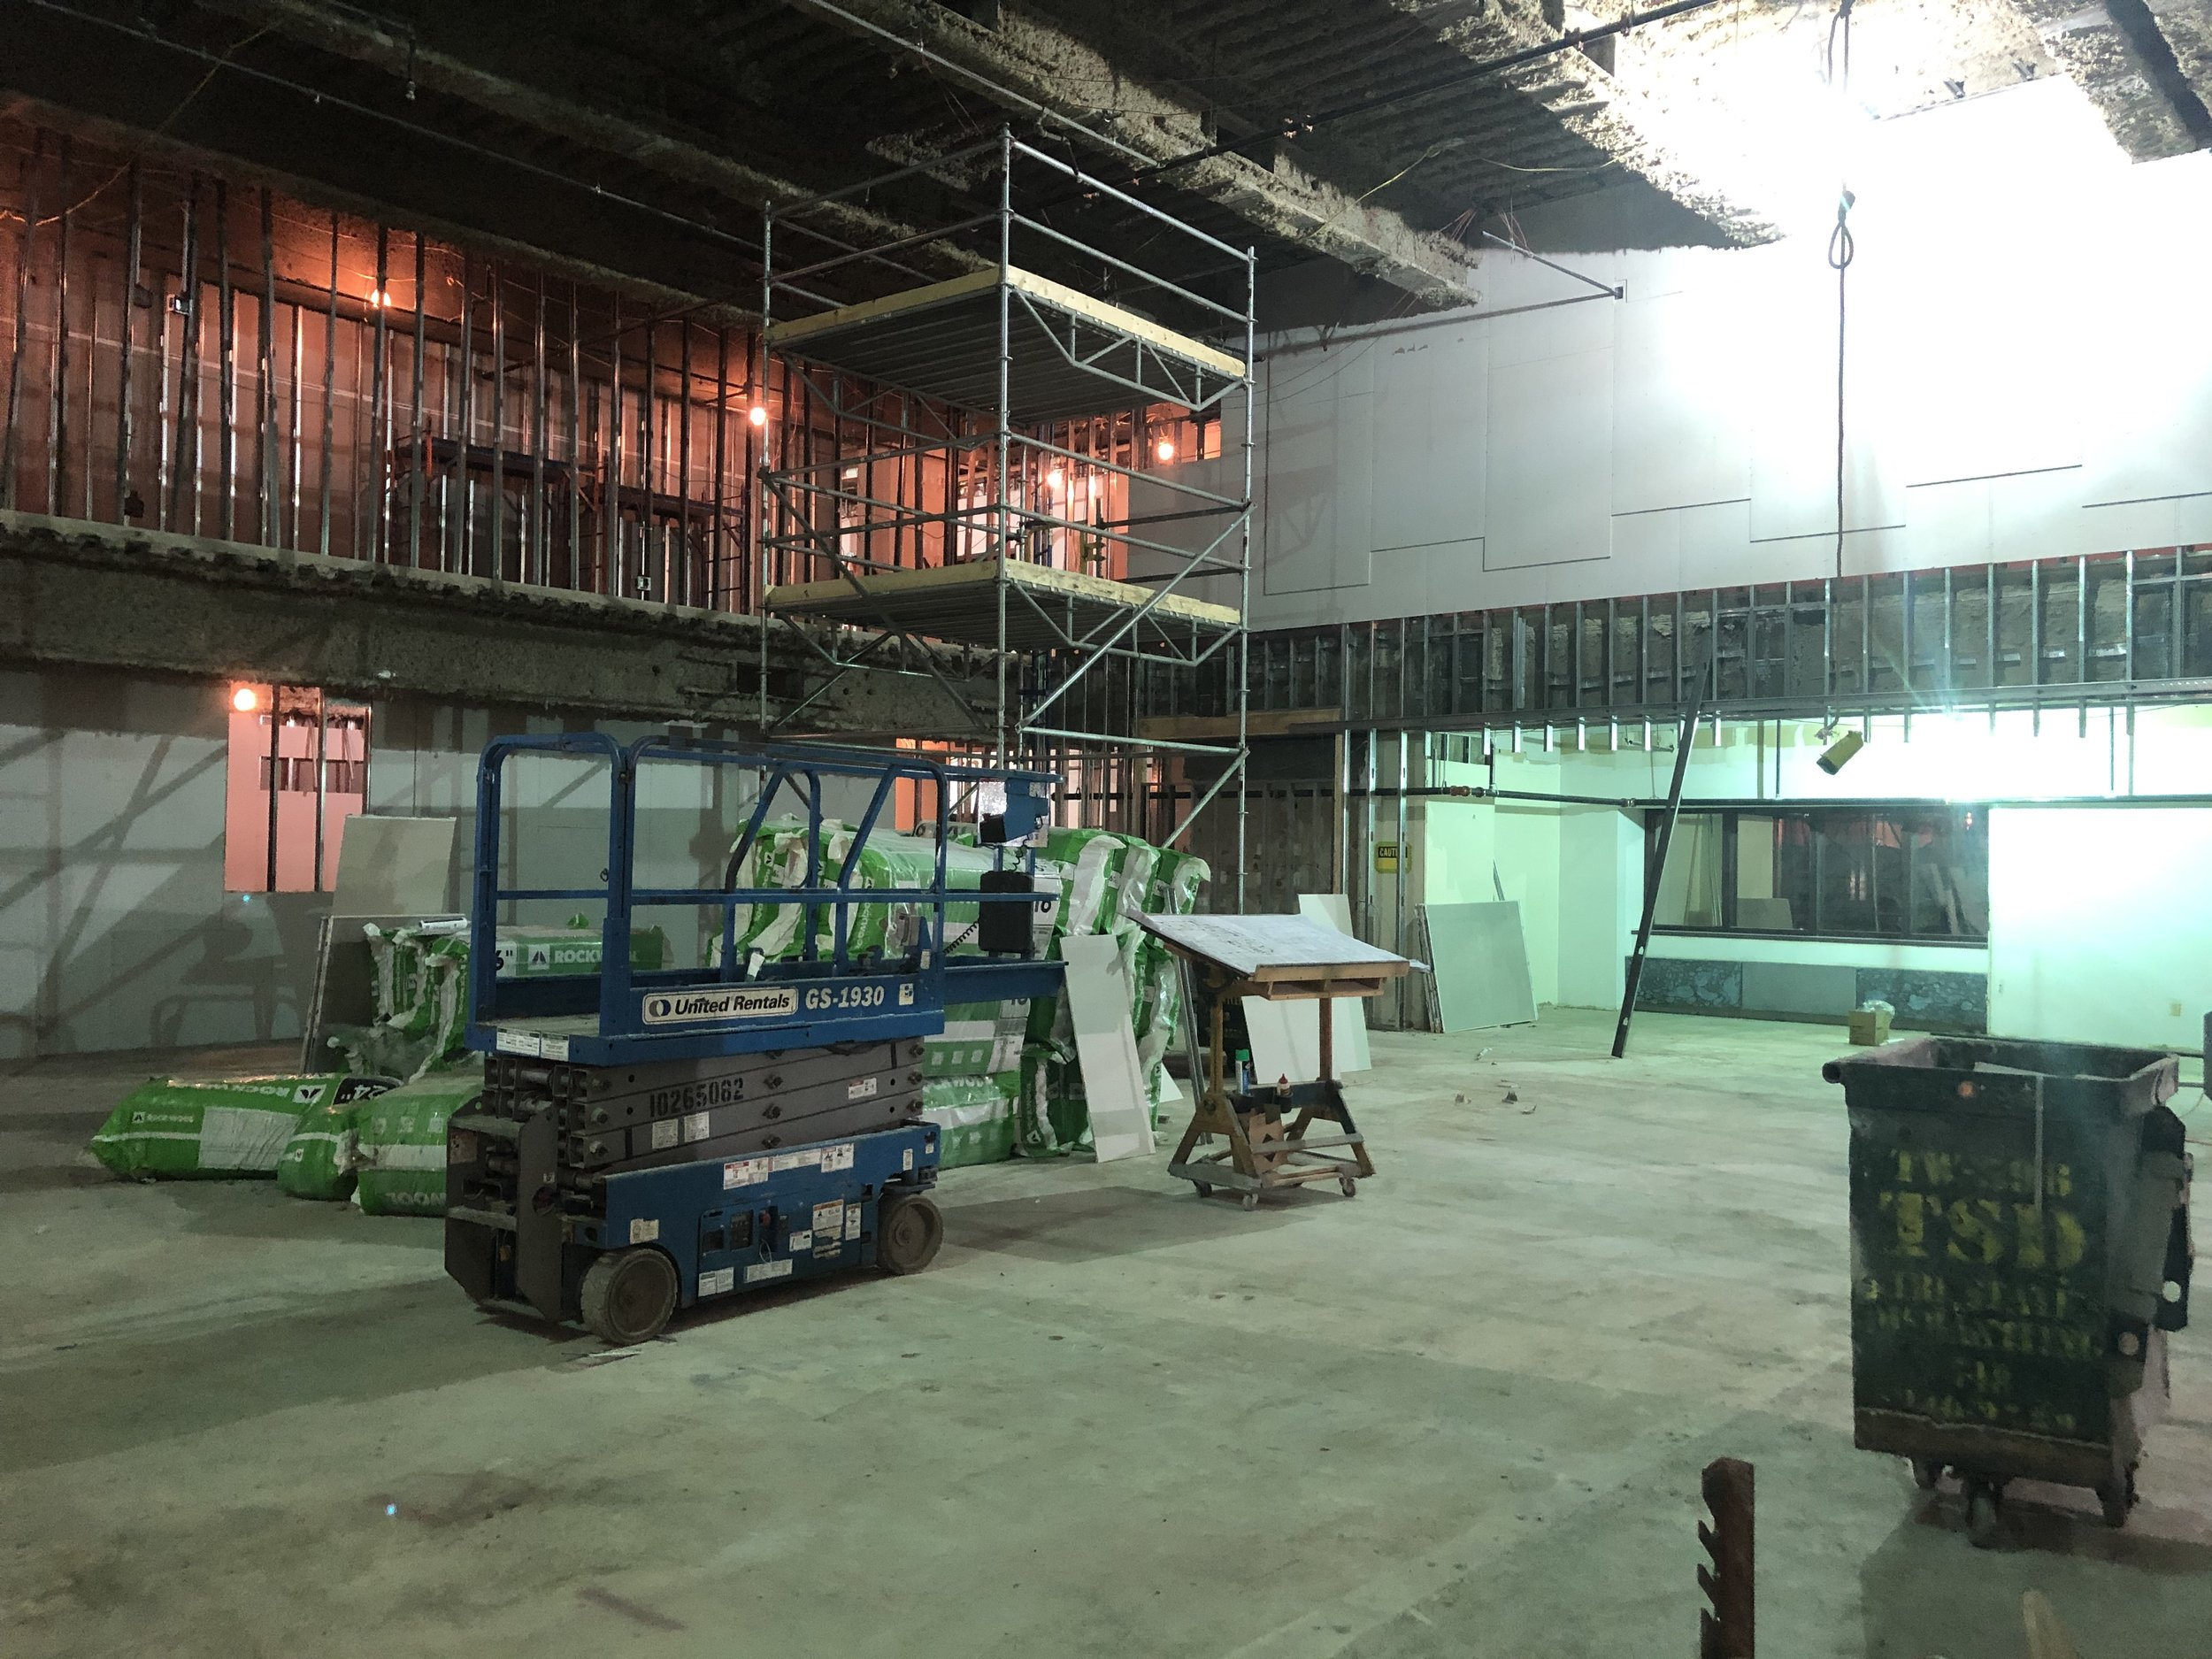 Studio 11B (12-15-18)